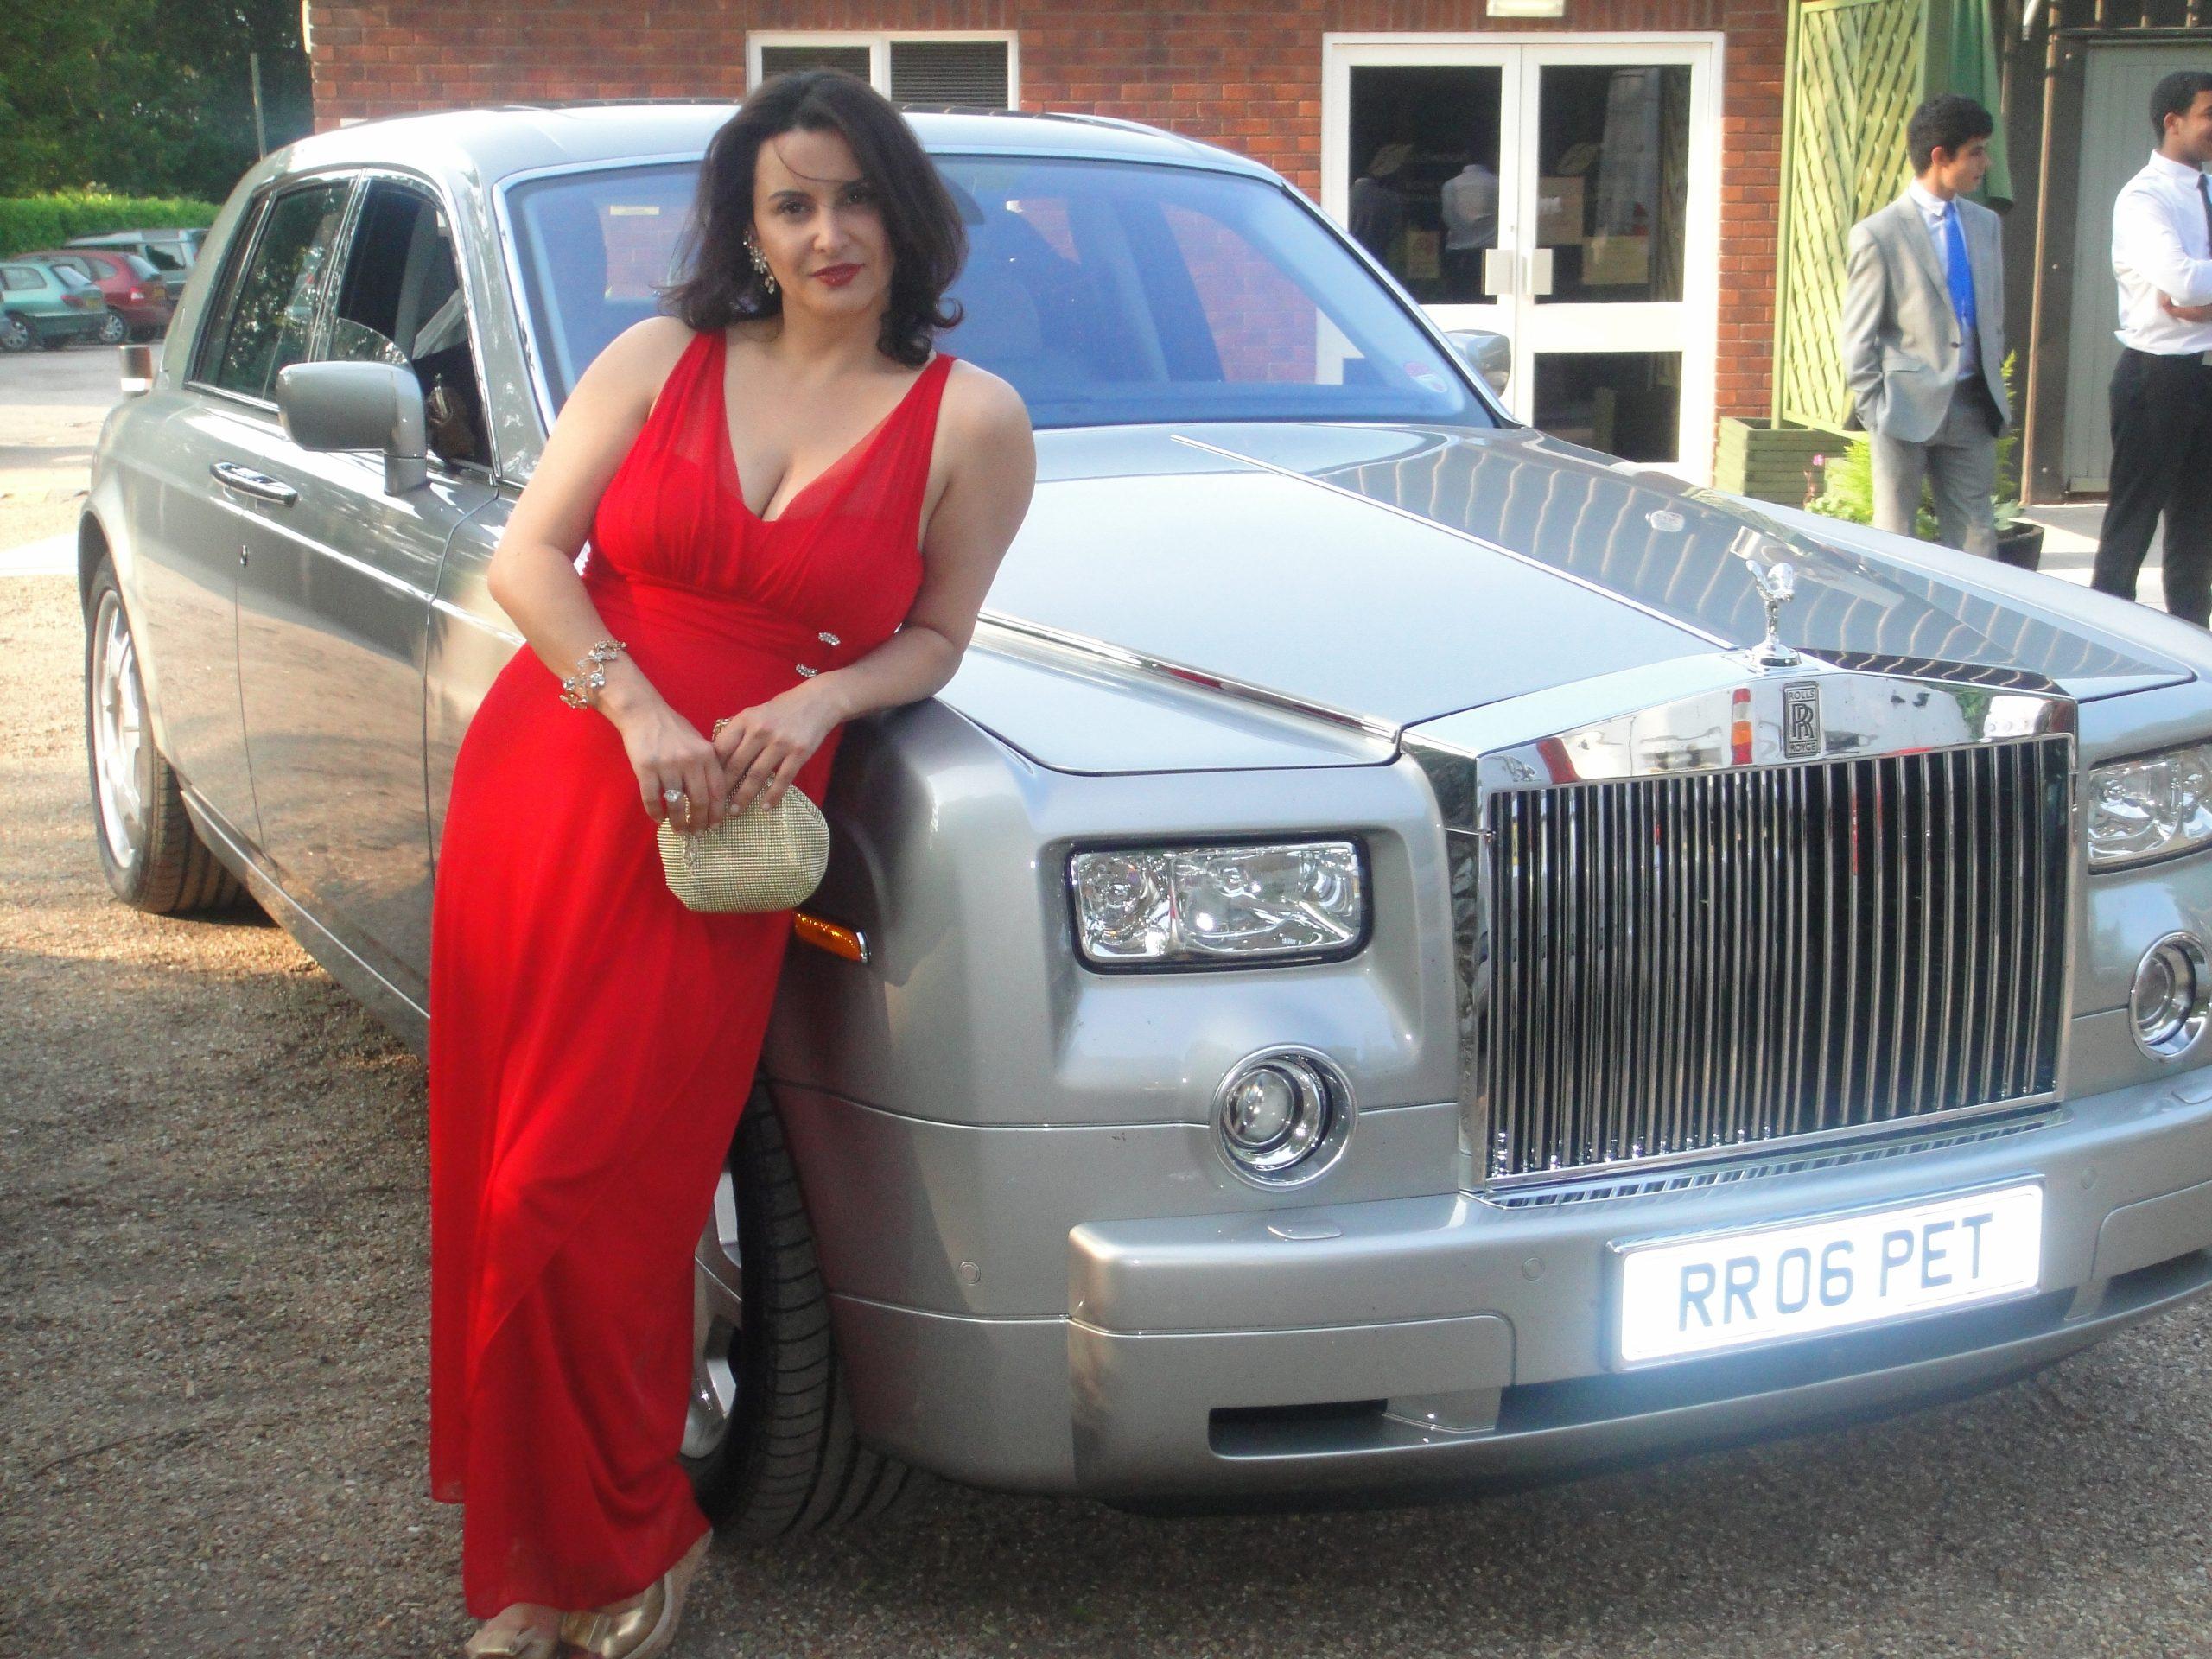 Genealogist Poses with Phantom Rolls Royce